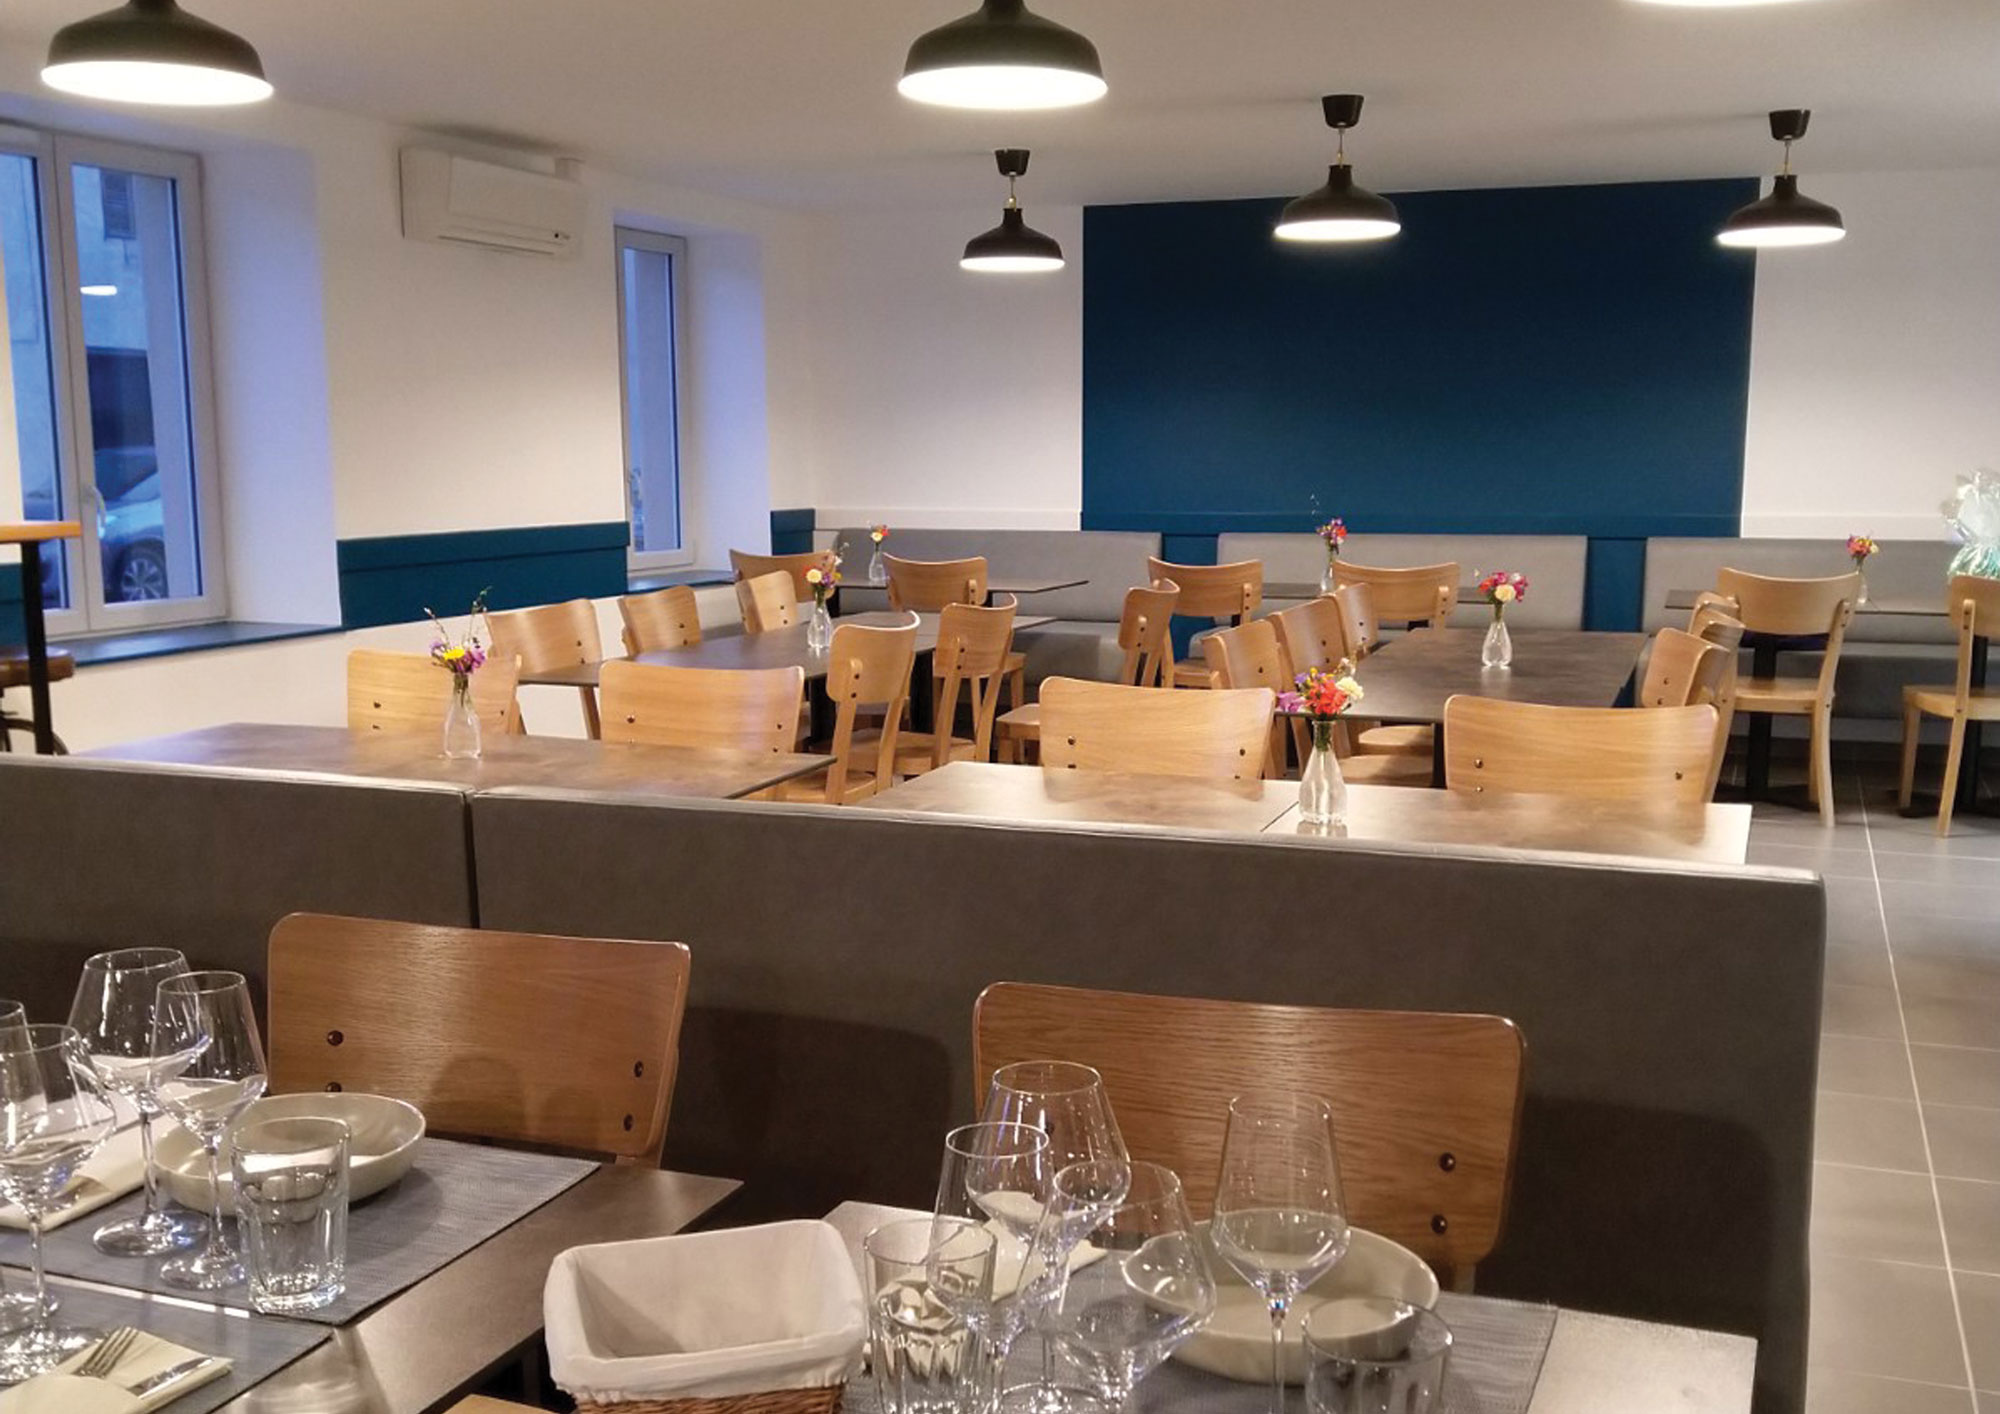 pack-deco-agencement-interieur-salle-restaurant-chez-jups-saint-aubin-jura